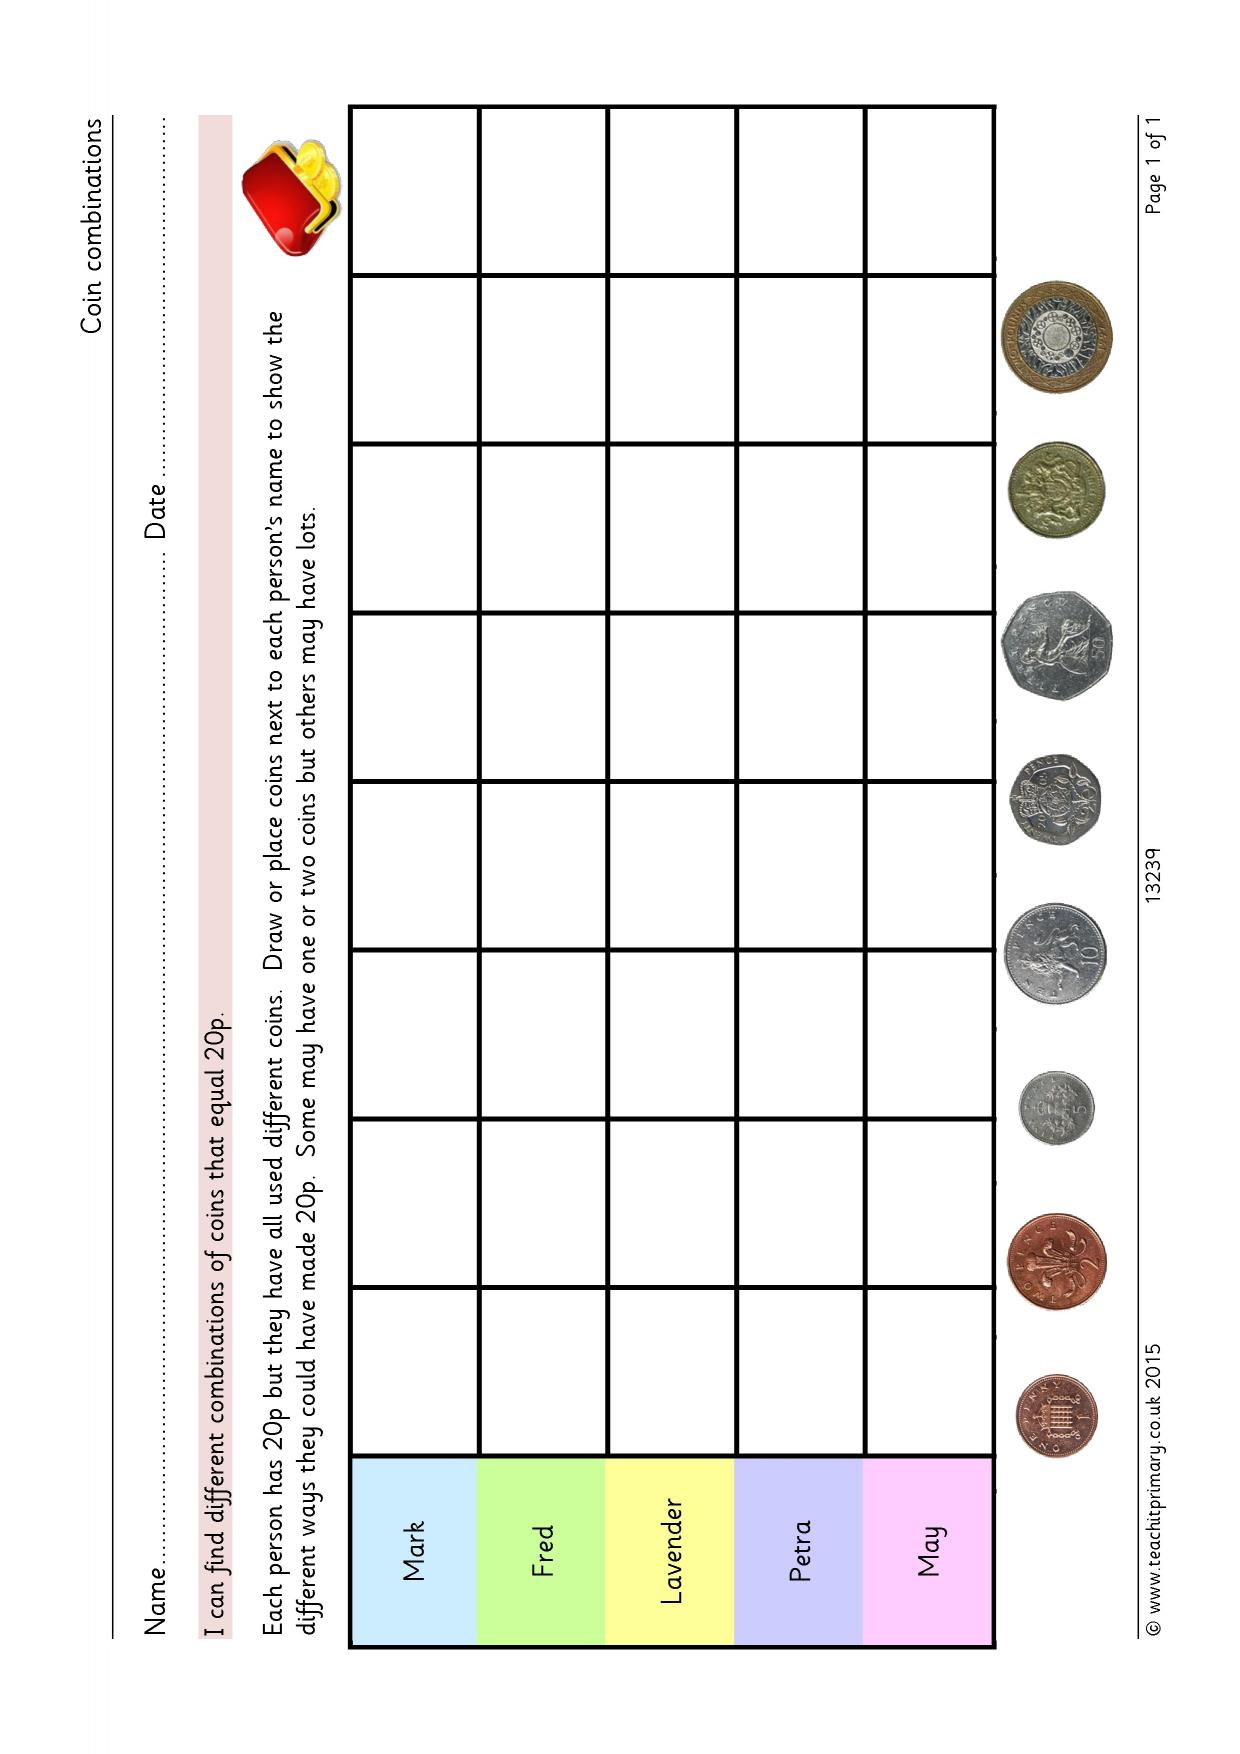 Ks1 Teaching Resources For Measurement